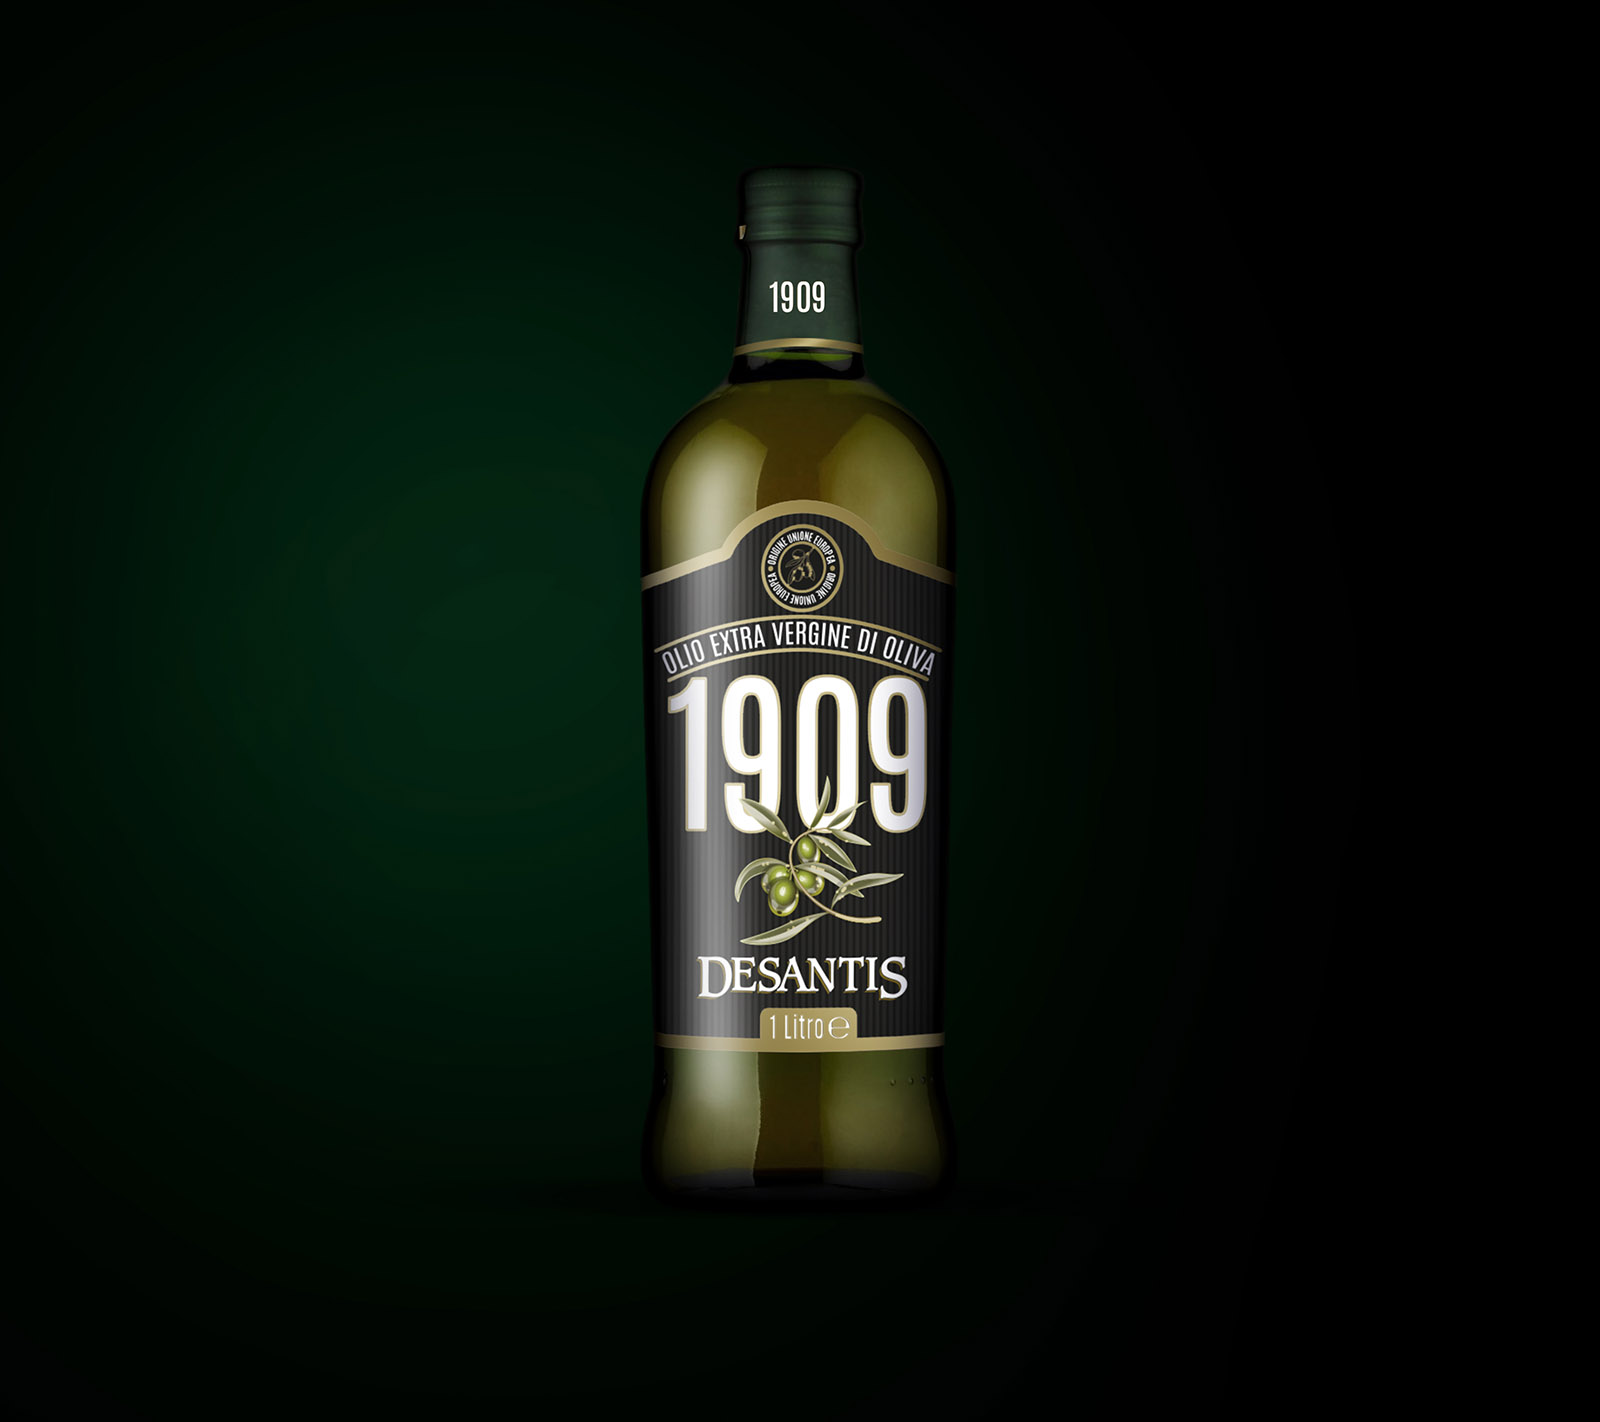 Desantis packaging_bottle